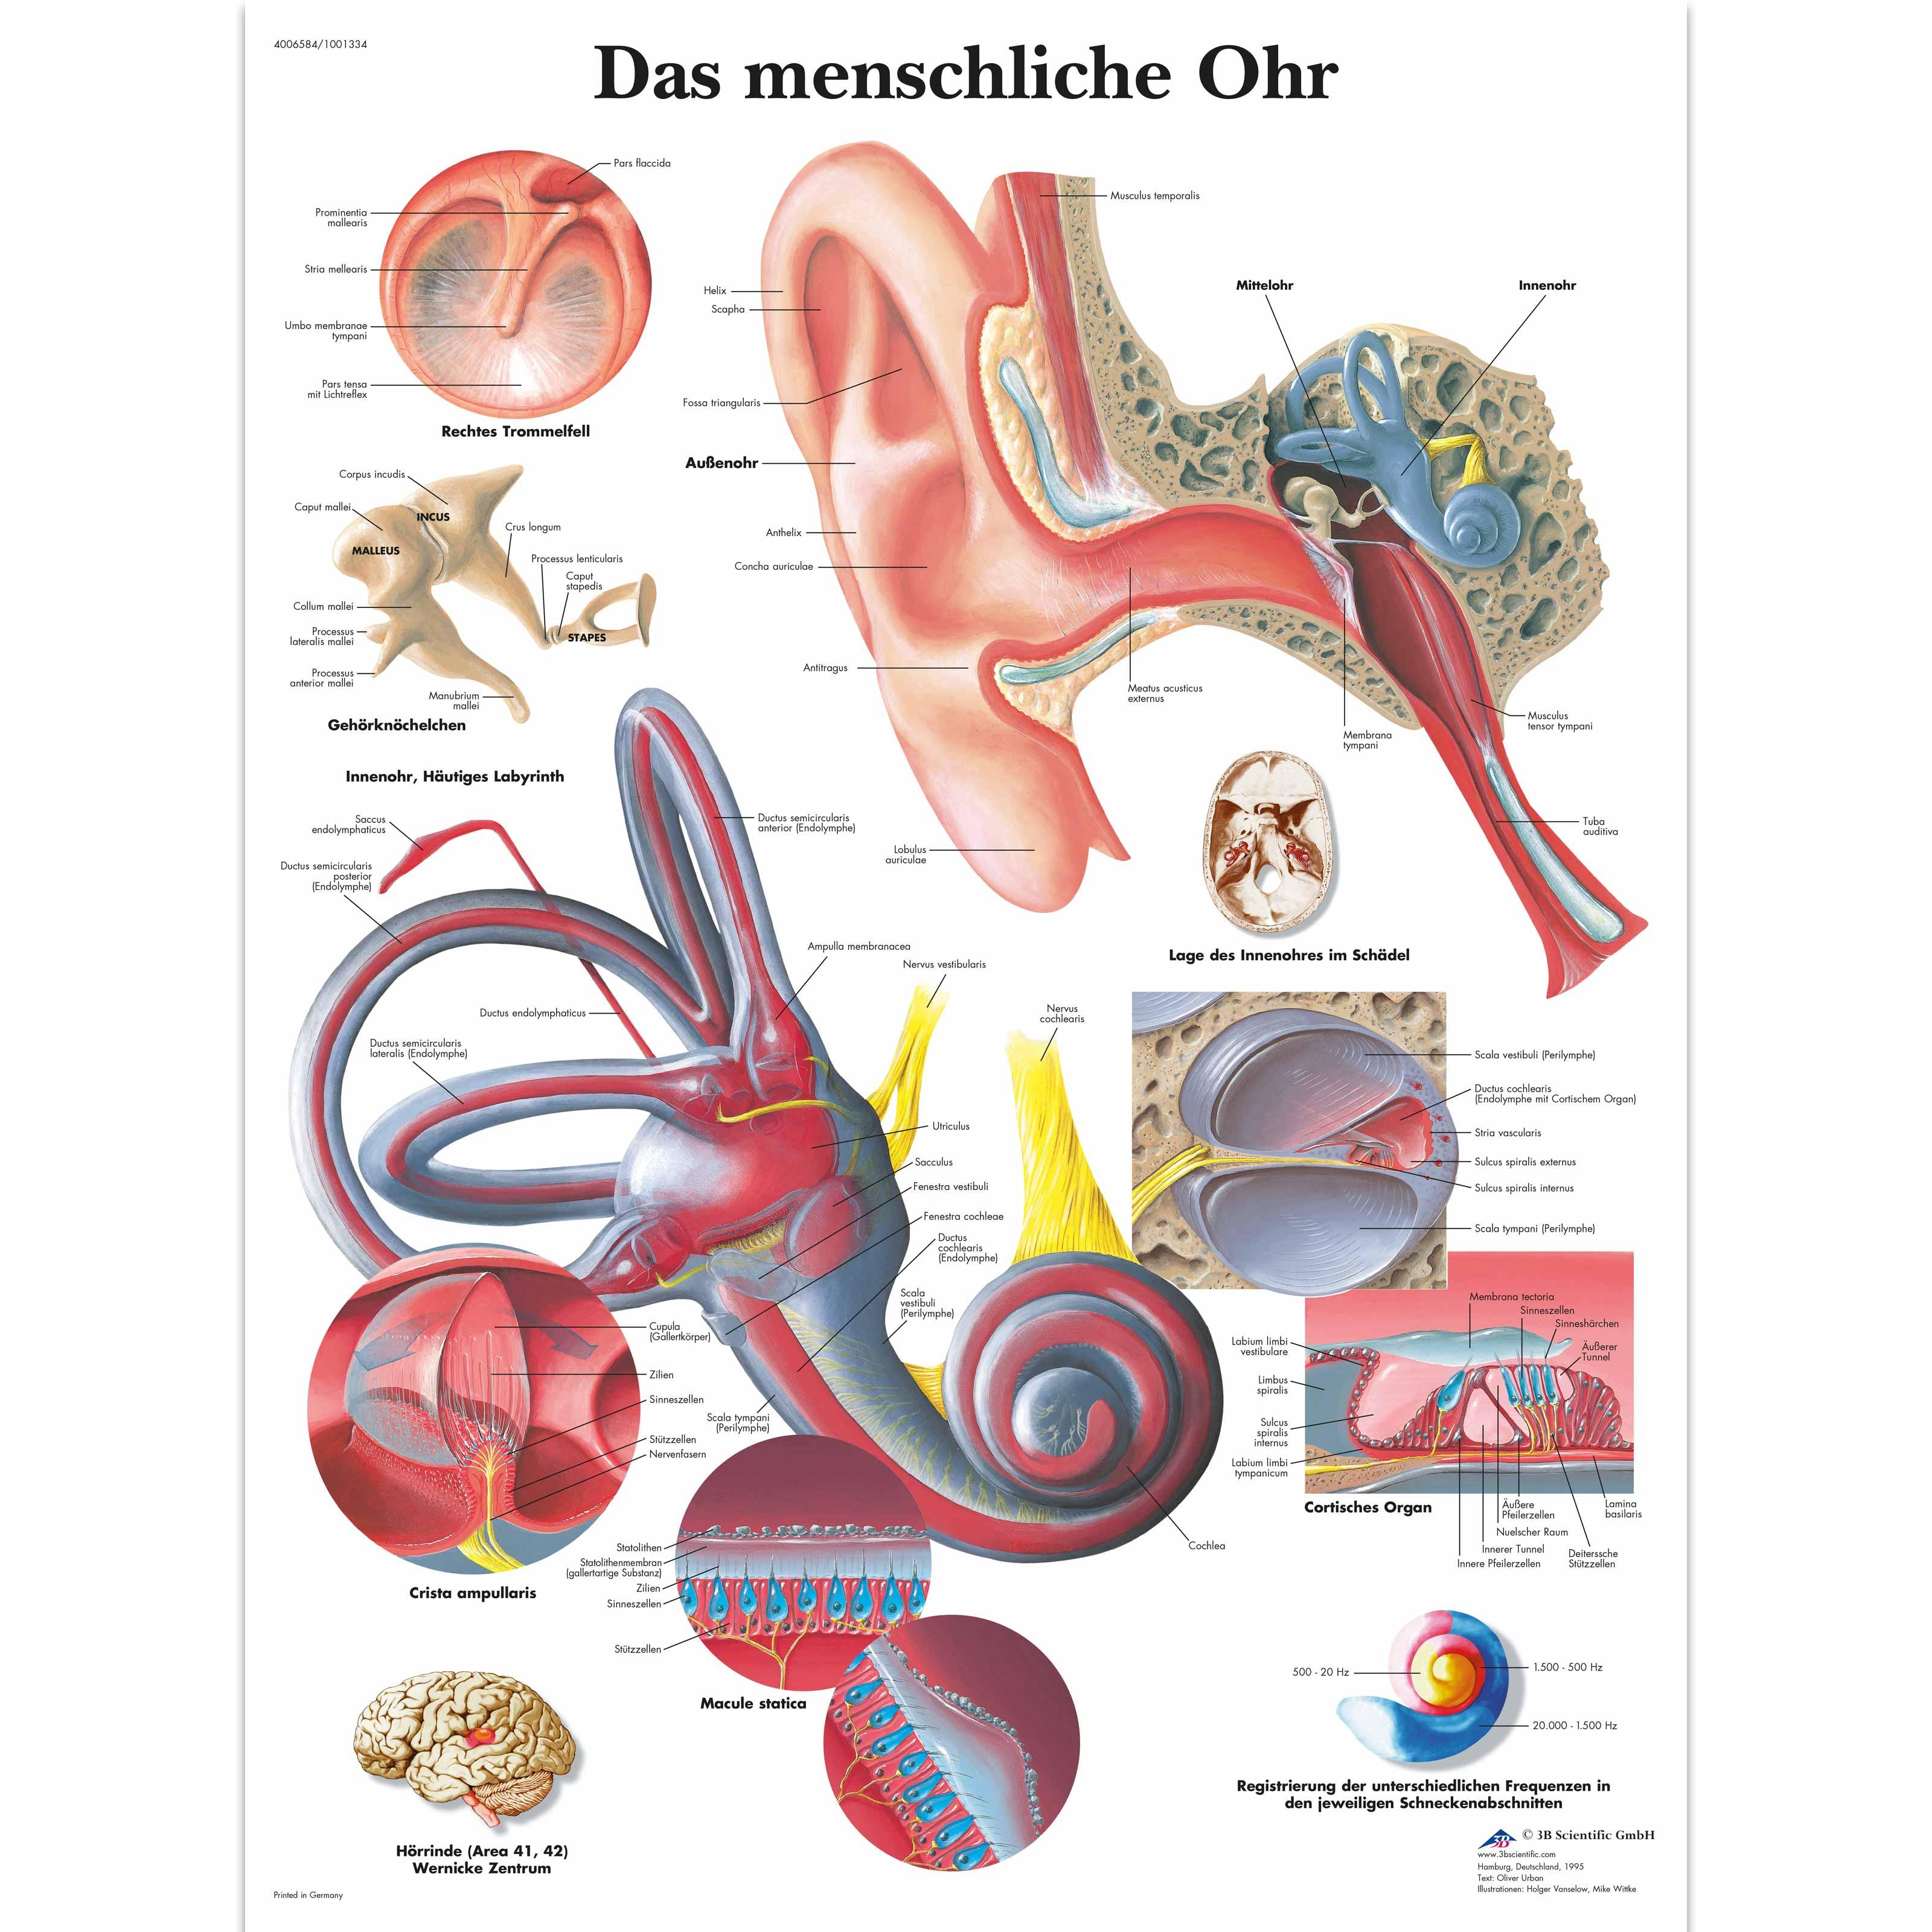 Das menschliche Ohr - 1001334 - VR0243L - Ear, Nose and Throat (ENT ...